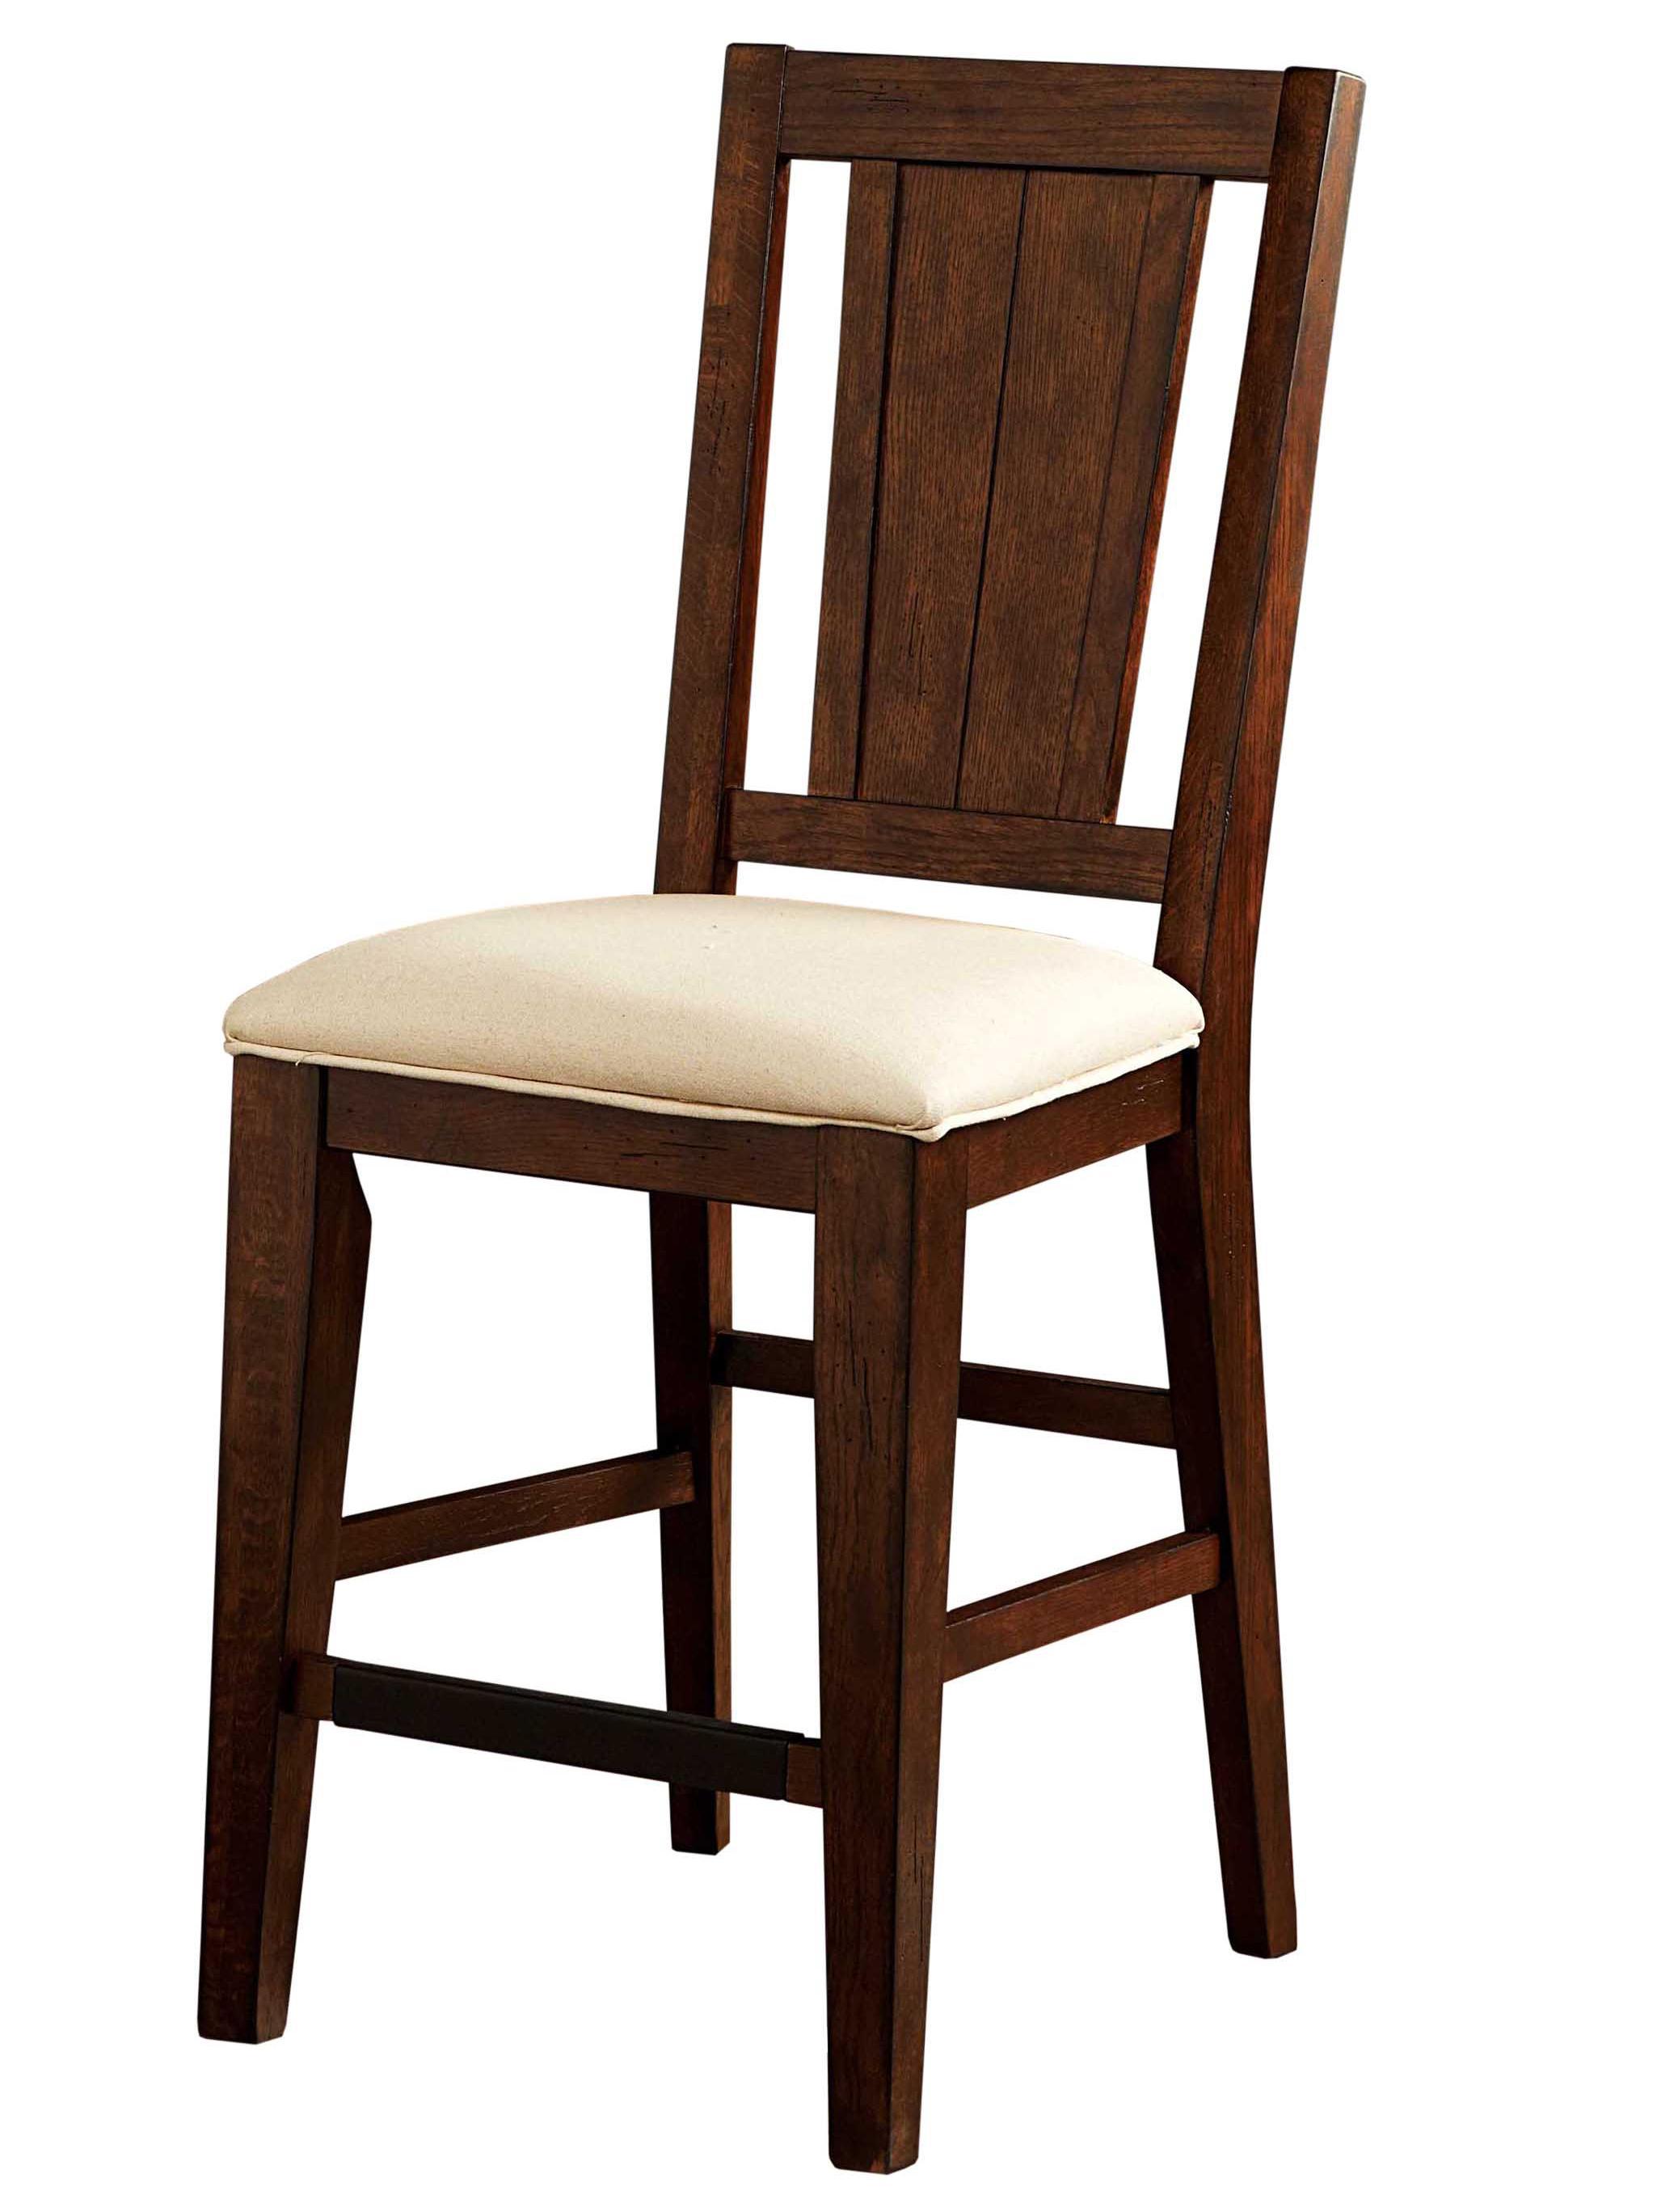 Broyhill furniture attic rustic splat back counter stool for Furniture for attics